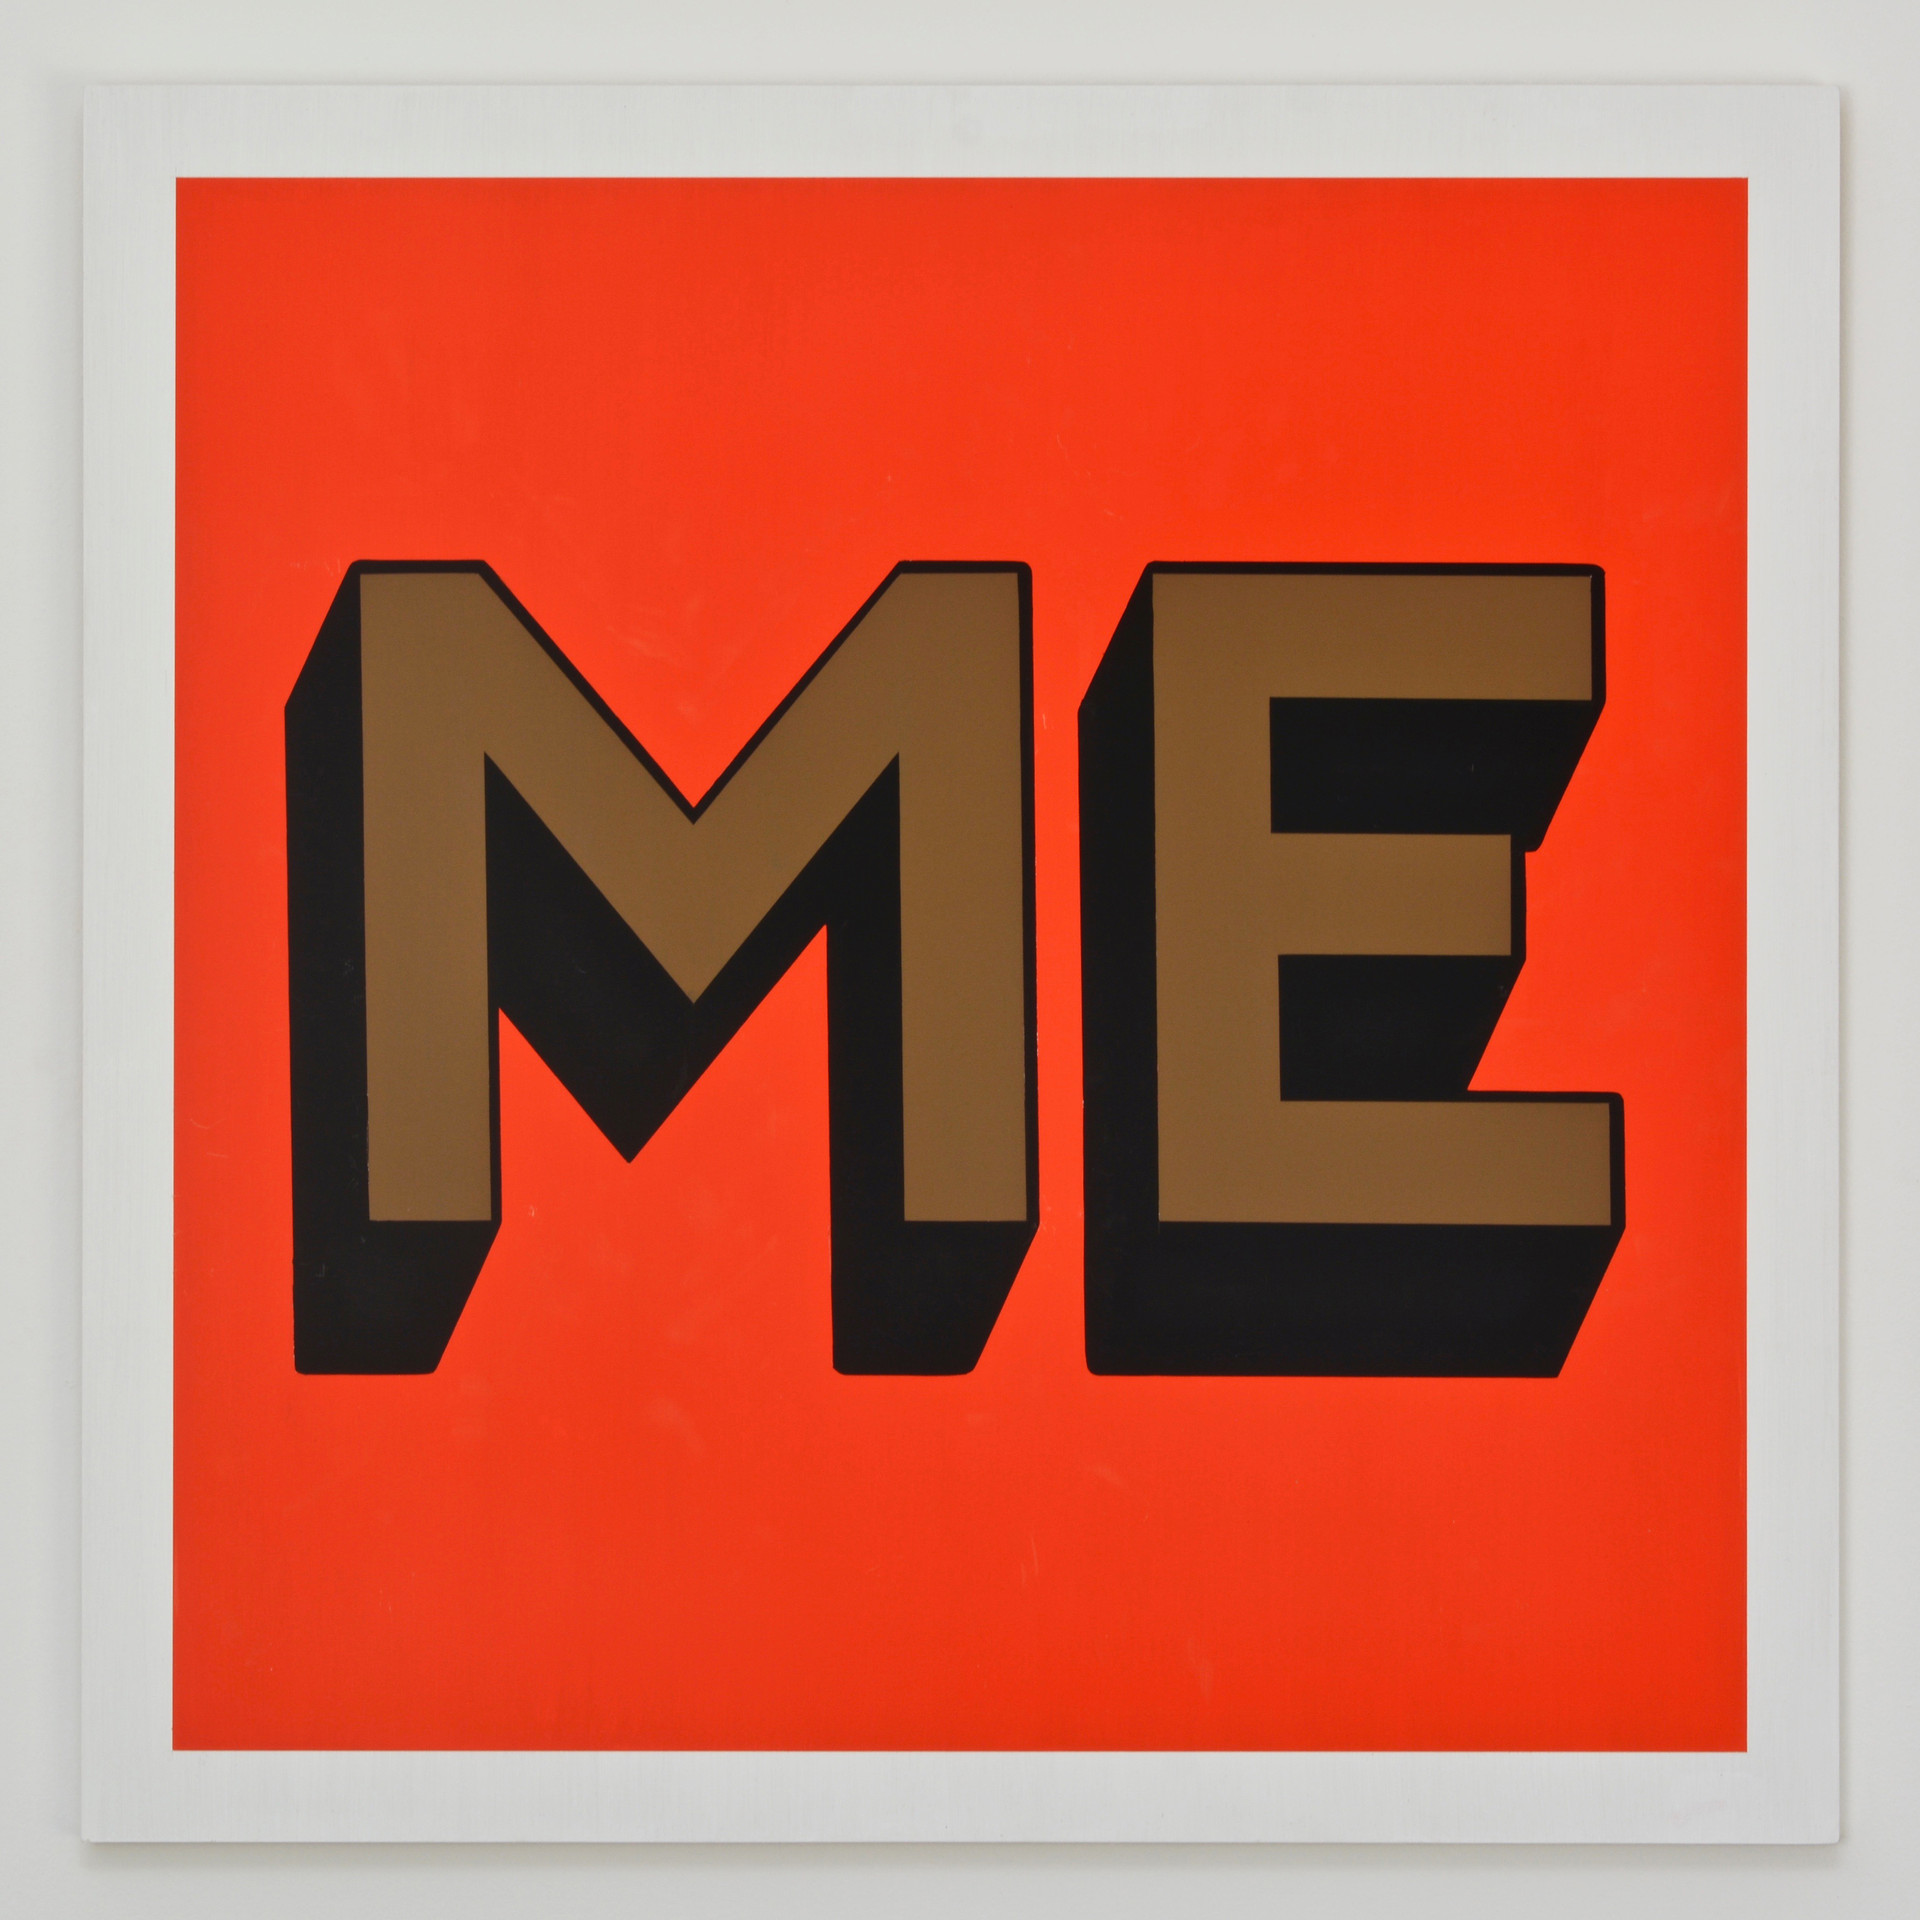 ME_025.jpg